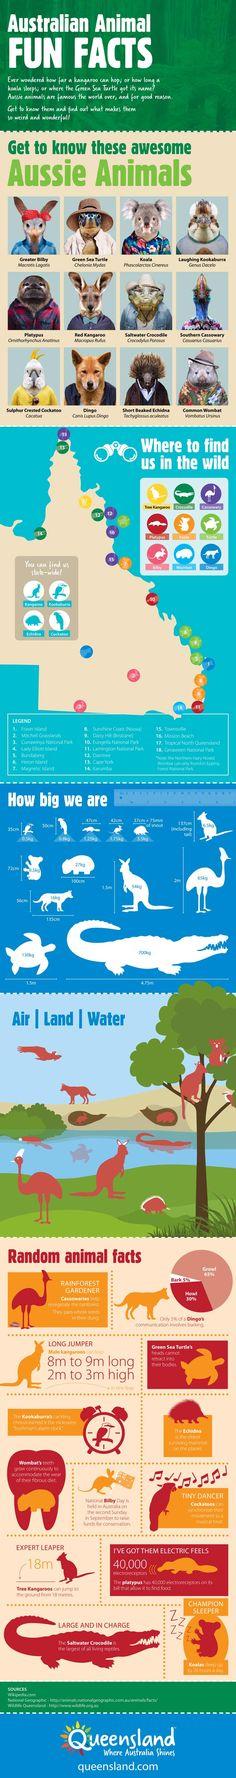 Australian Animal Facts Infographic